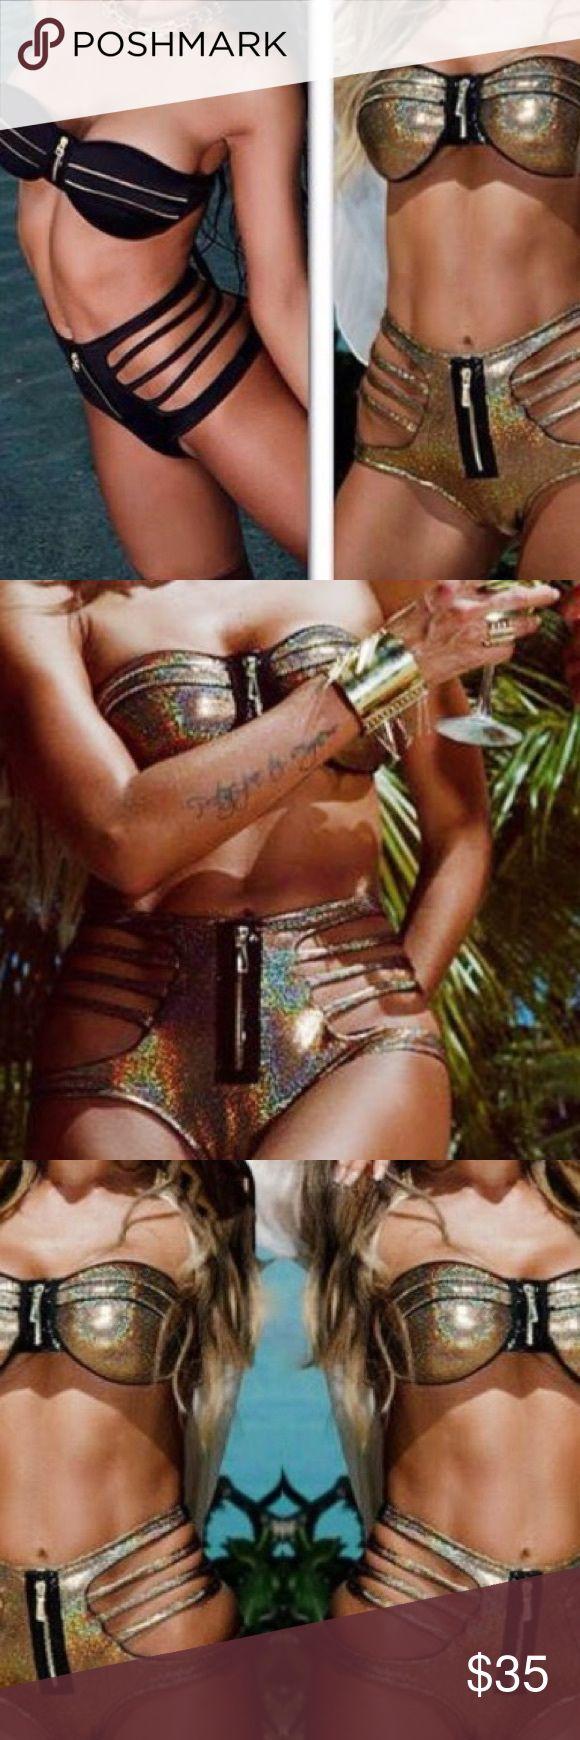 Metallic gold bikini high waisted bottoms In Now ⚡⚡👙📌📍Beautiful metallic gold bandeau bikini with high waisted strappy bottoms zips up in front adopt Swim Bikinis